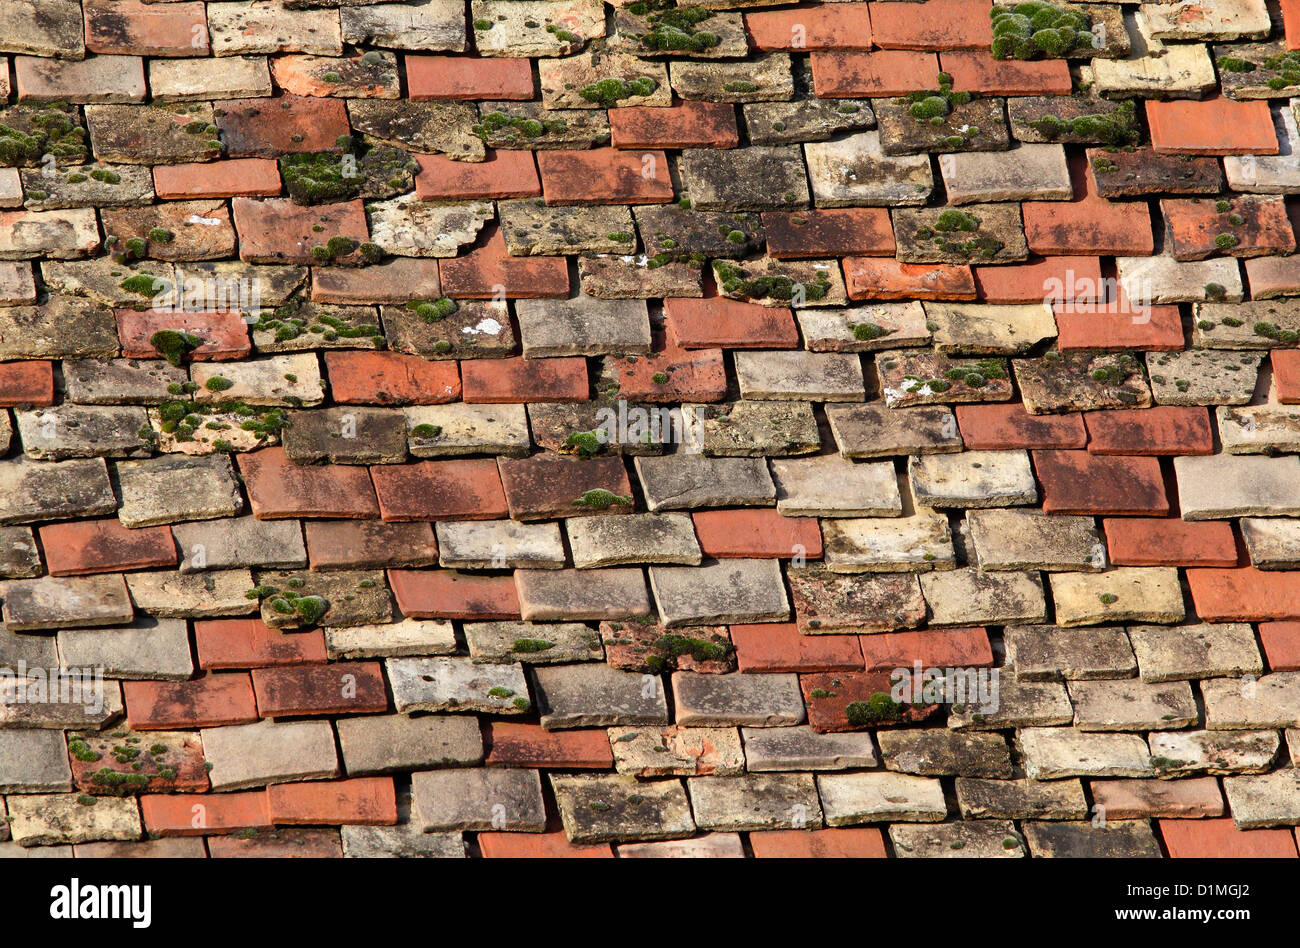 old-roof-tiles-D1MGJ2.jpg